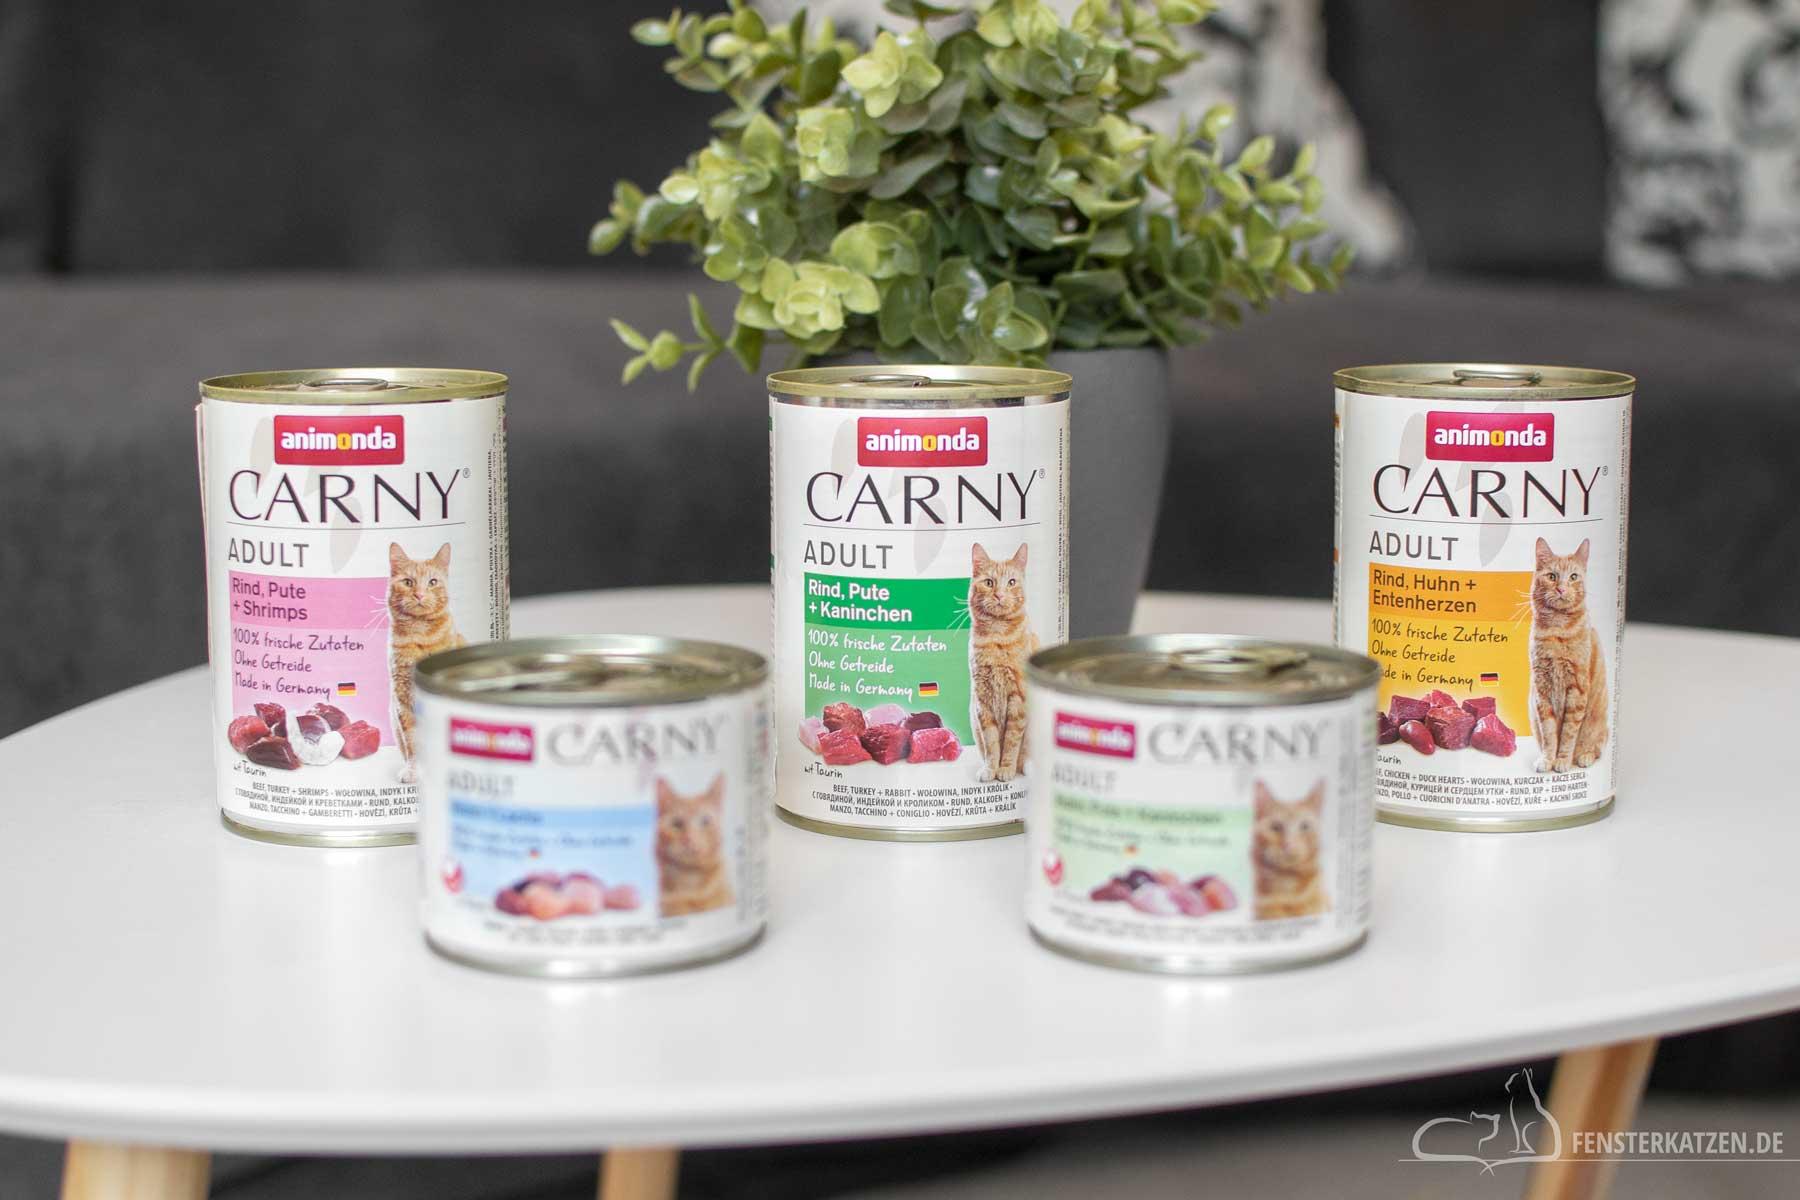 Fensterkatzen-Ratgeber-Animonda-Carny-Adult-Sorten-Dosen